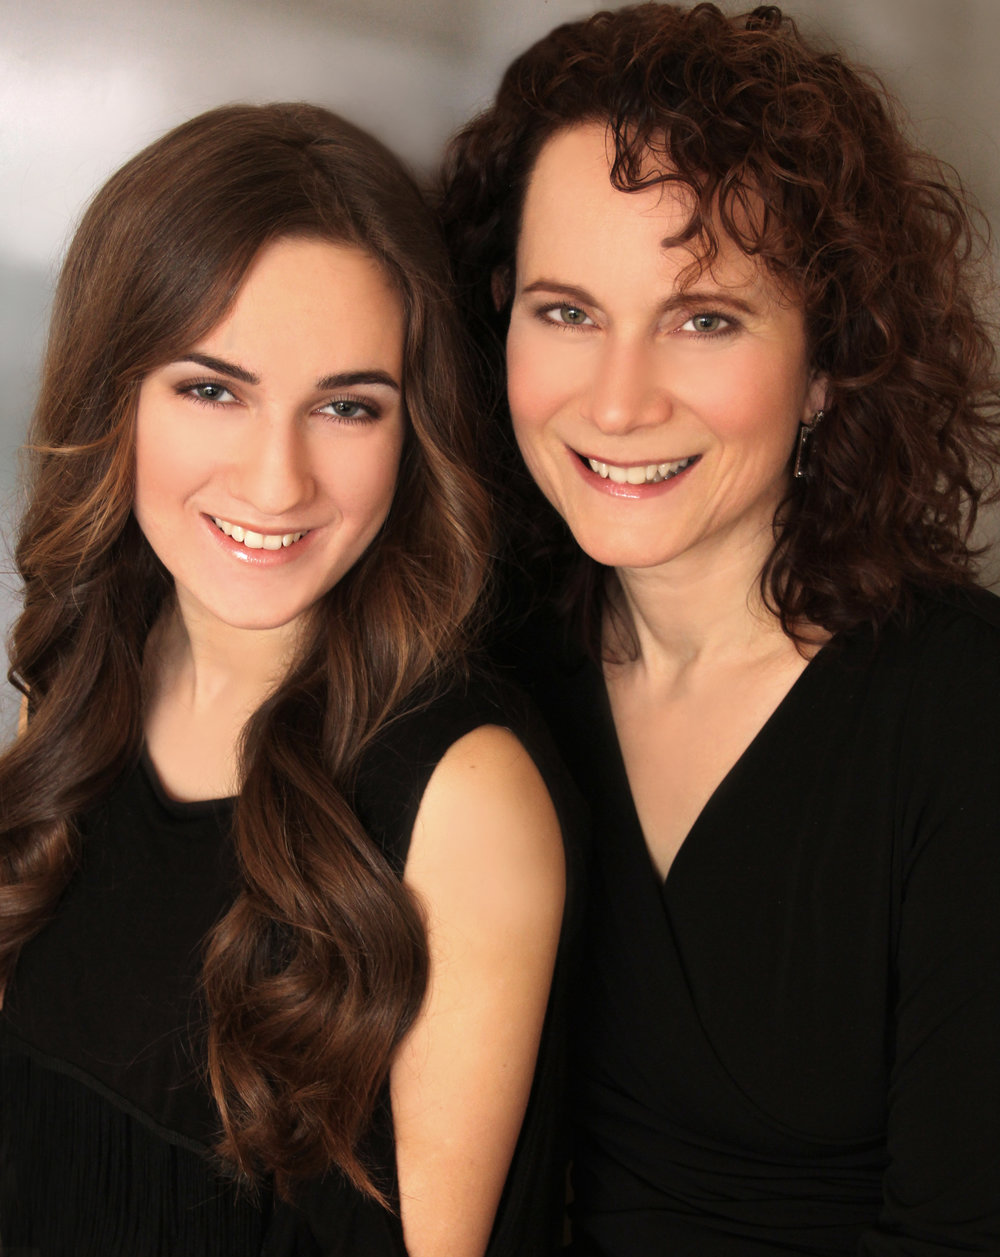 Morgan and Kathryne Pirtle